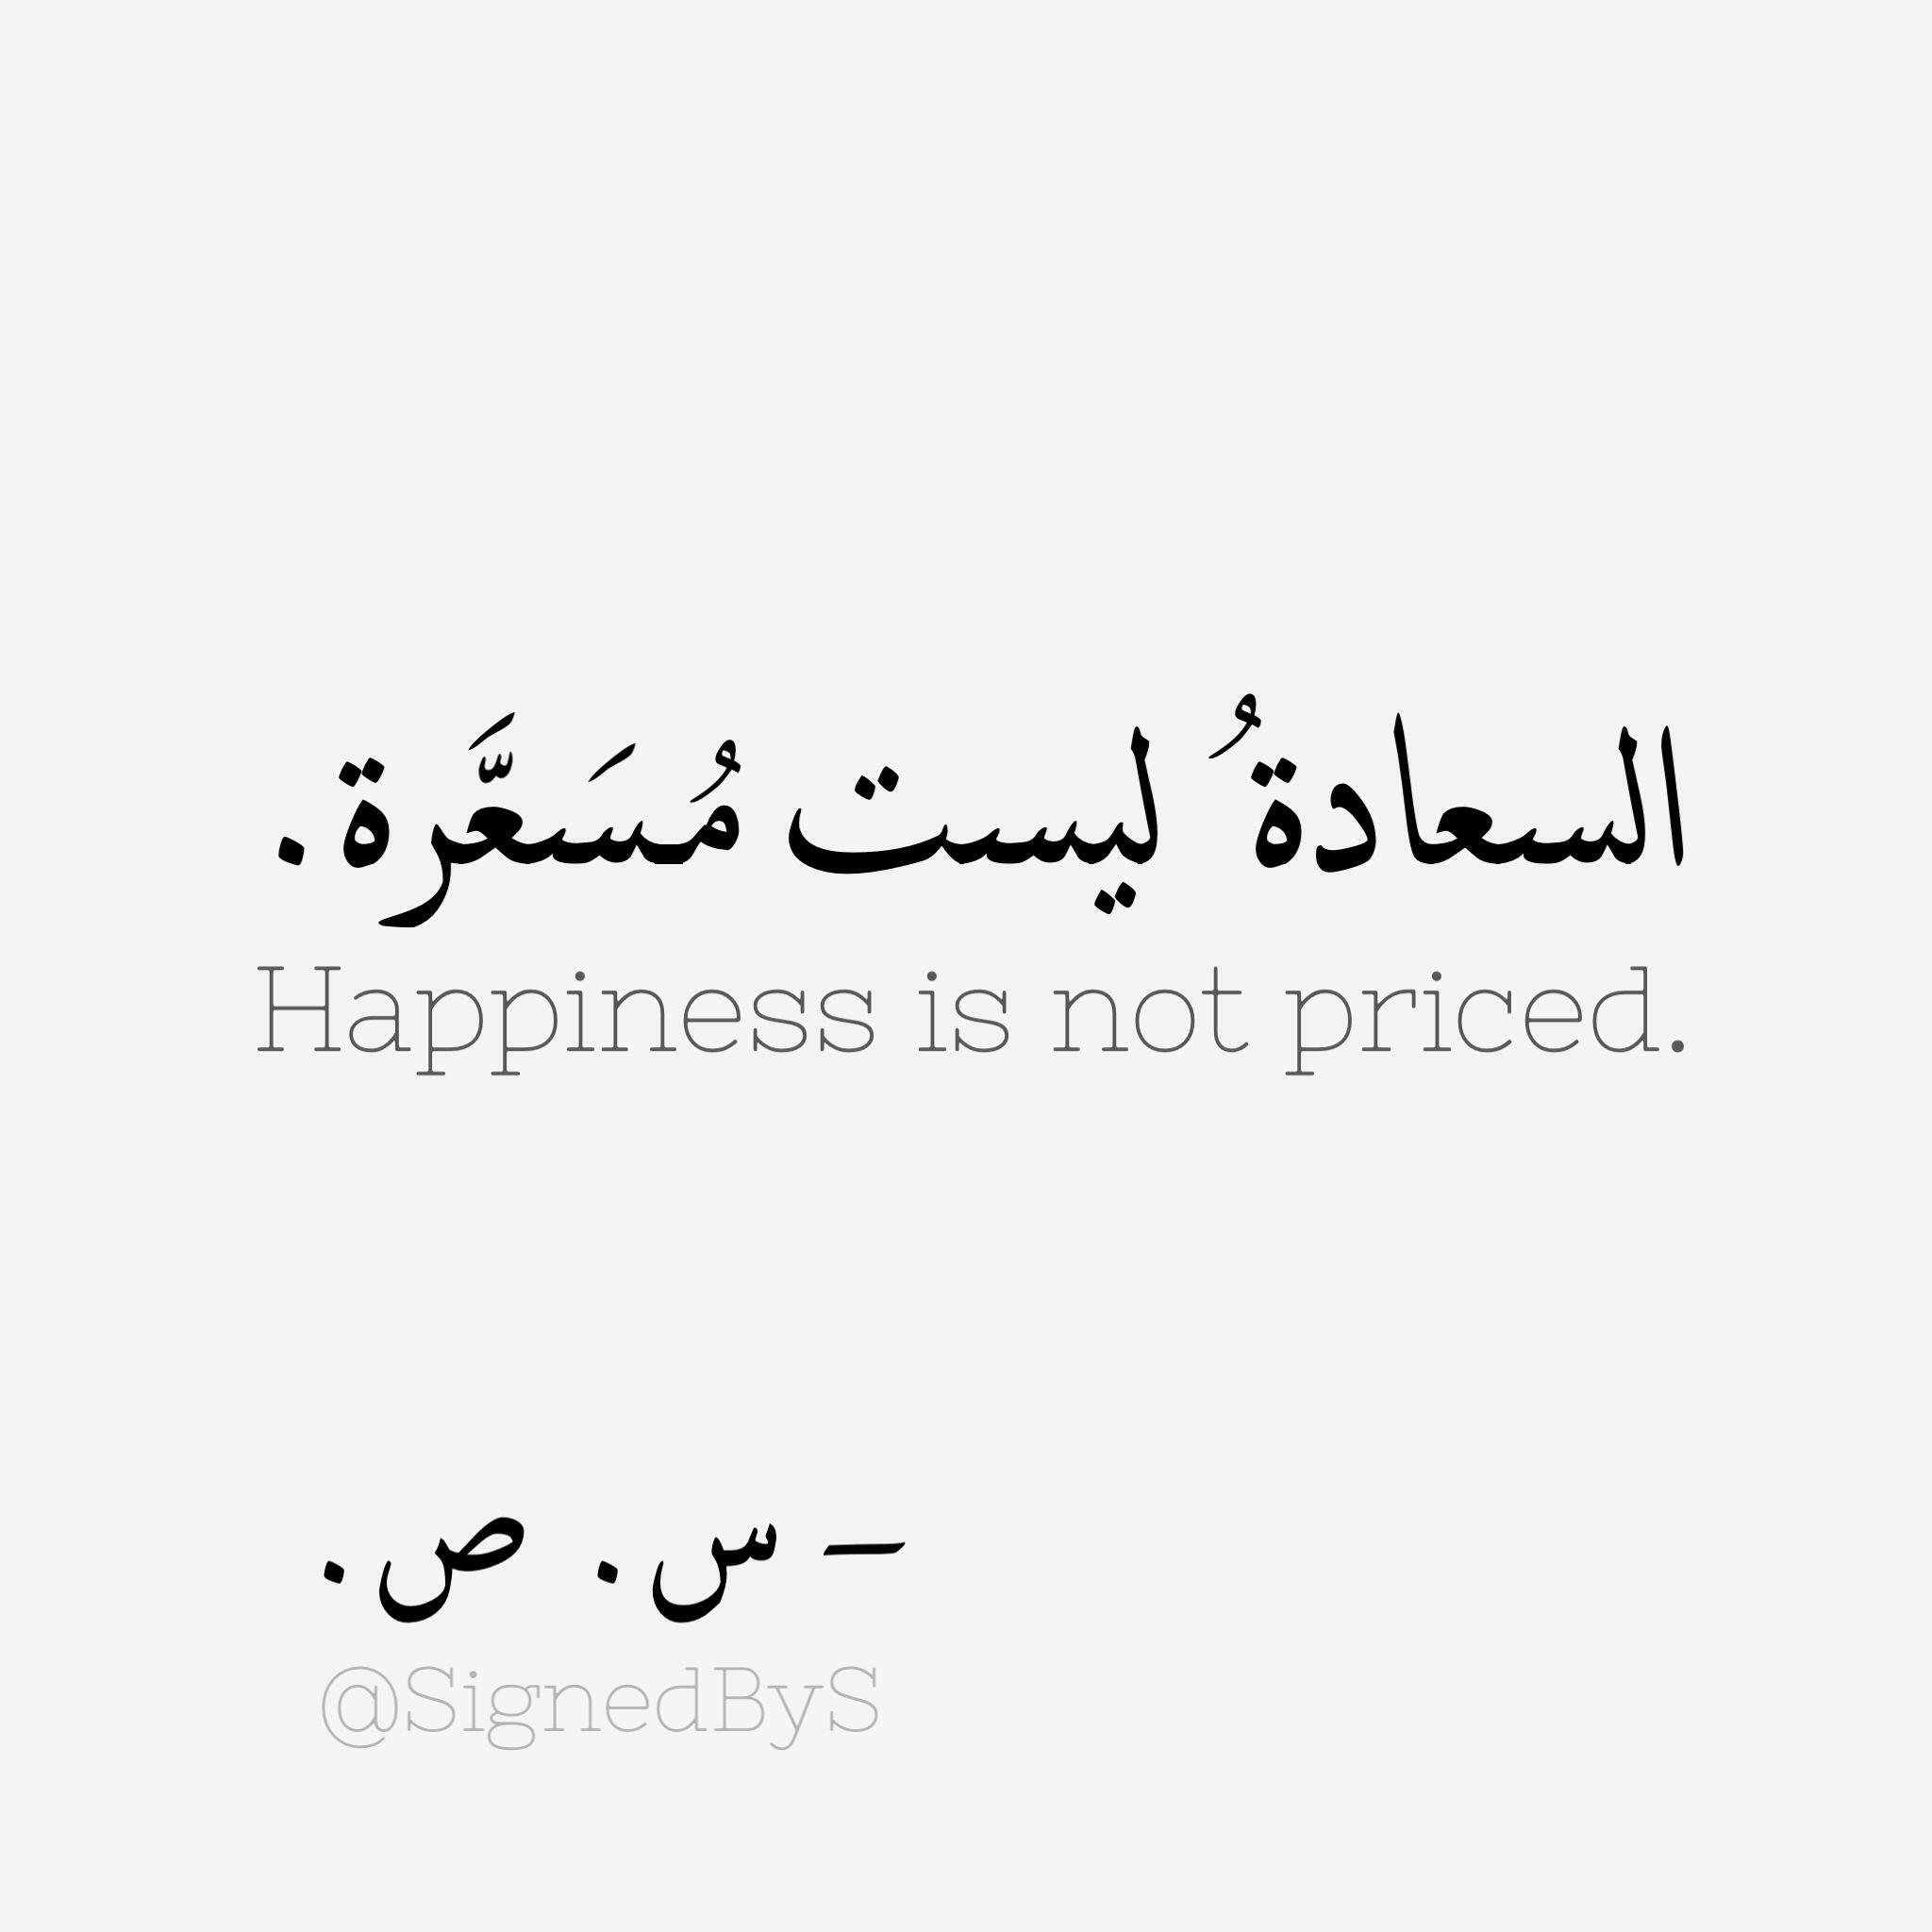 Happiness is not priced! u0627u0644u0633u0639u0627u062fu0629 | Random~ | Pinterest | Happiness Arabic quotes and Islam